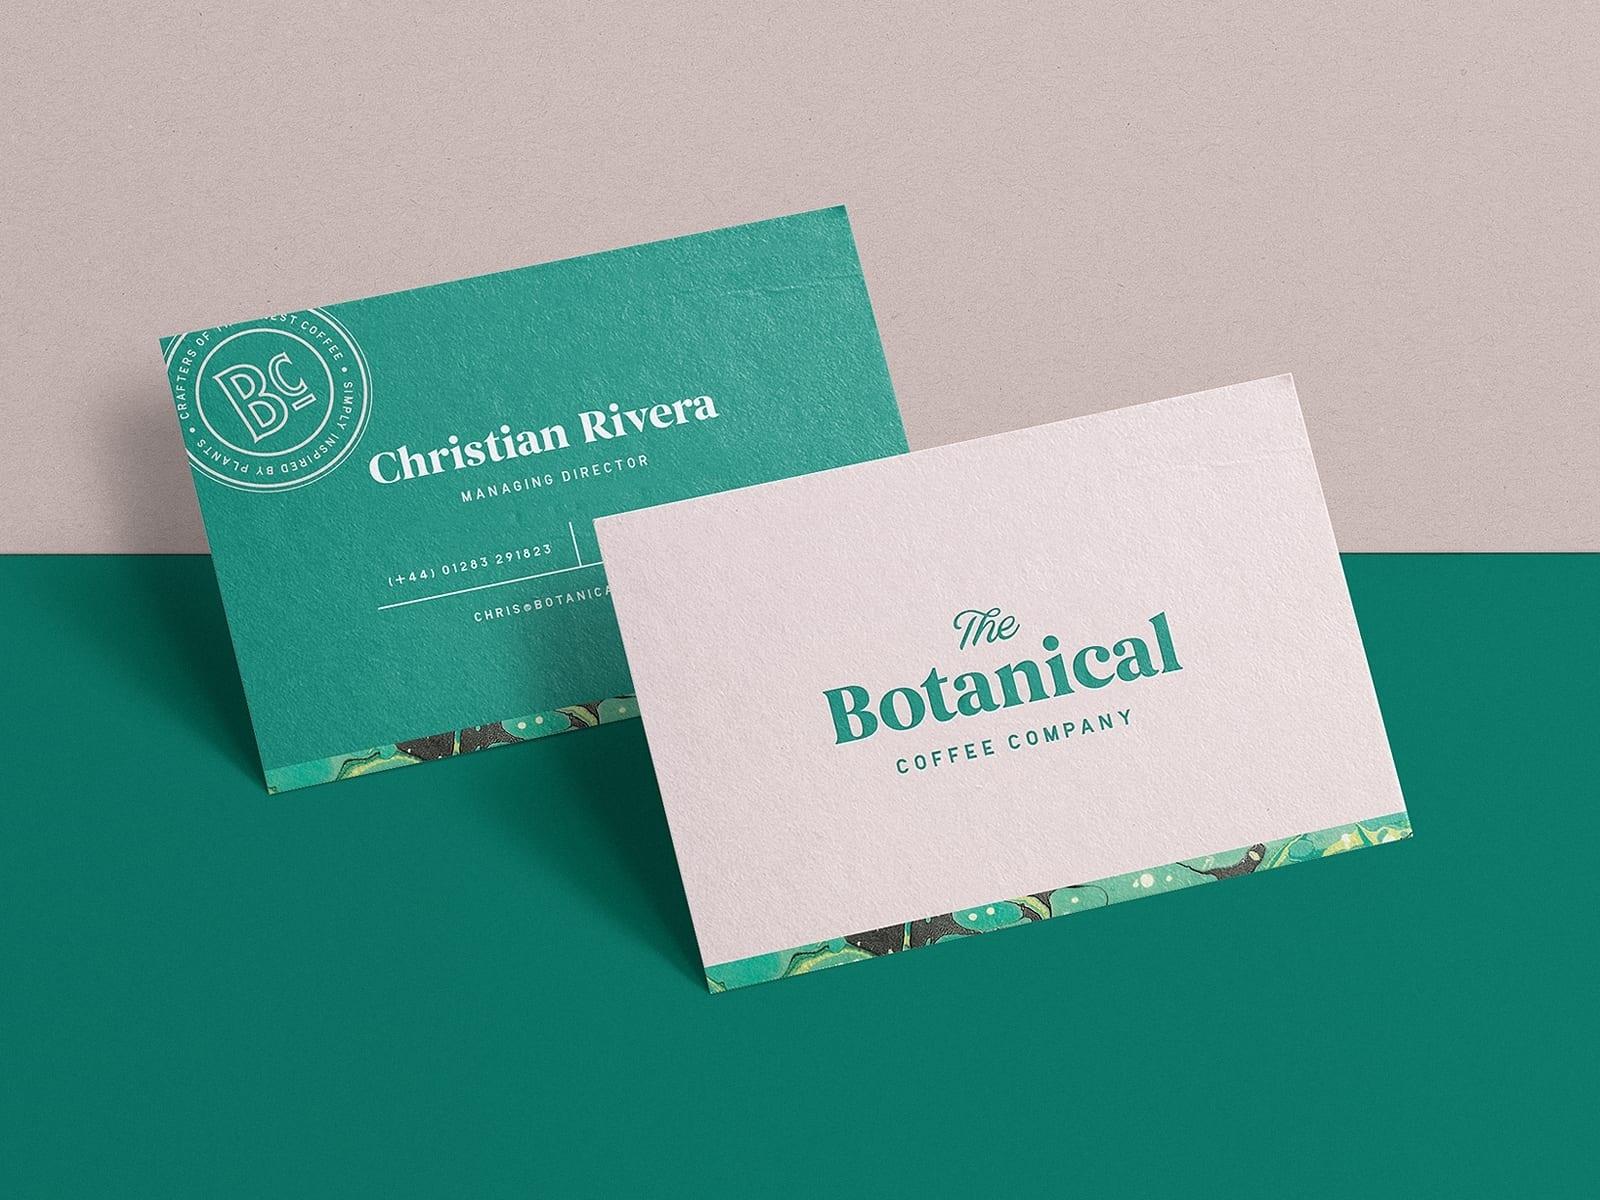 Botanical Coffee Co 05 - Ach, tie obaly – Botanical Coffee Co.